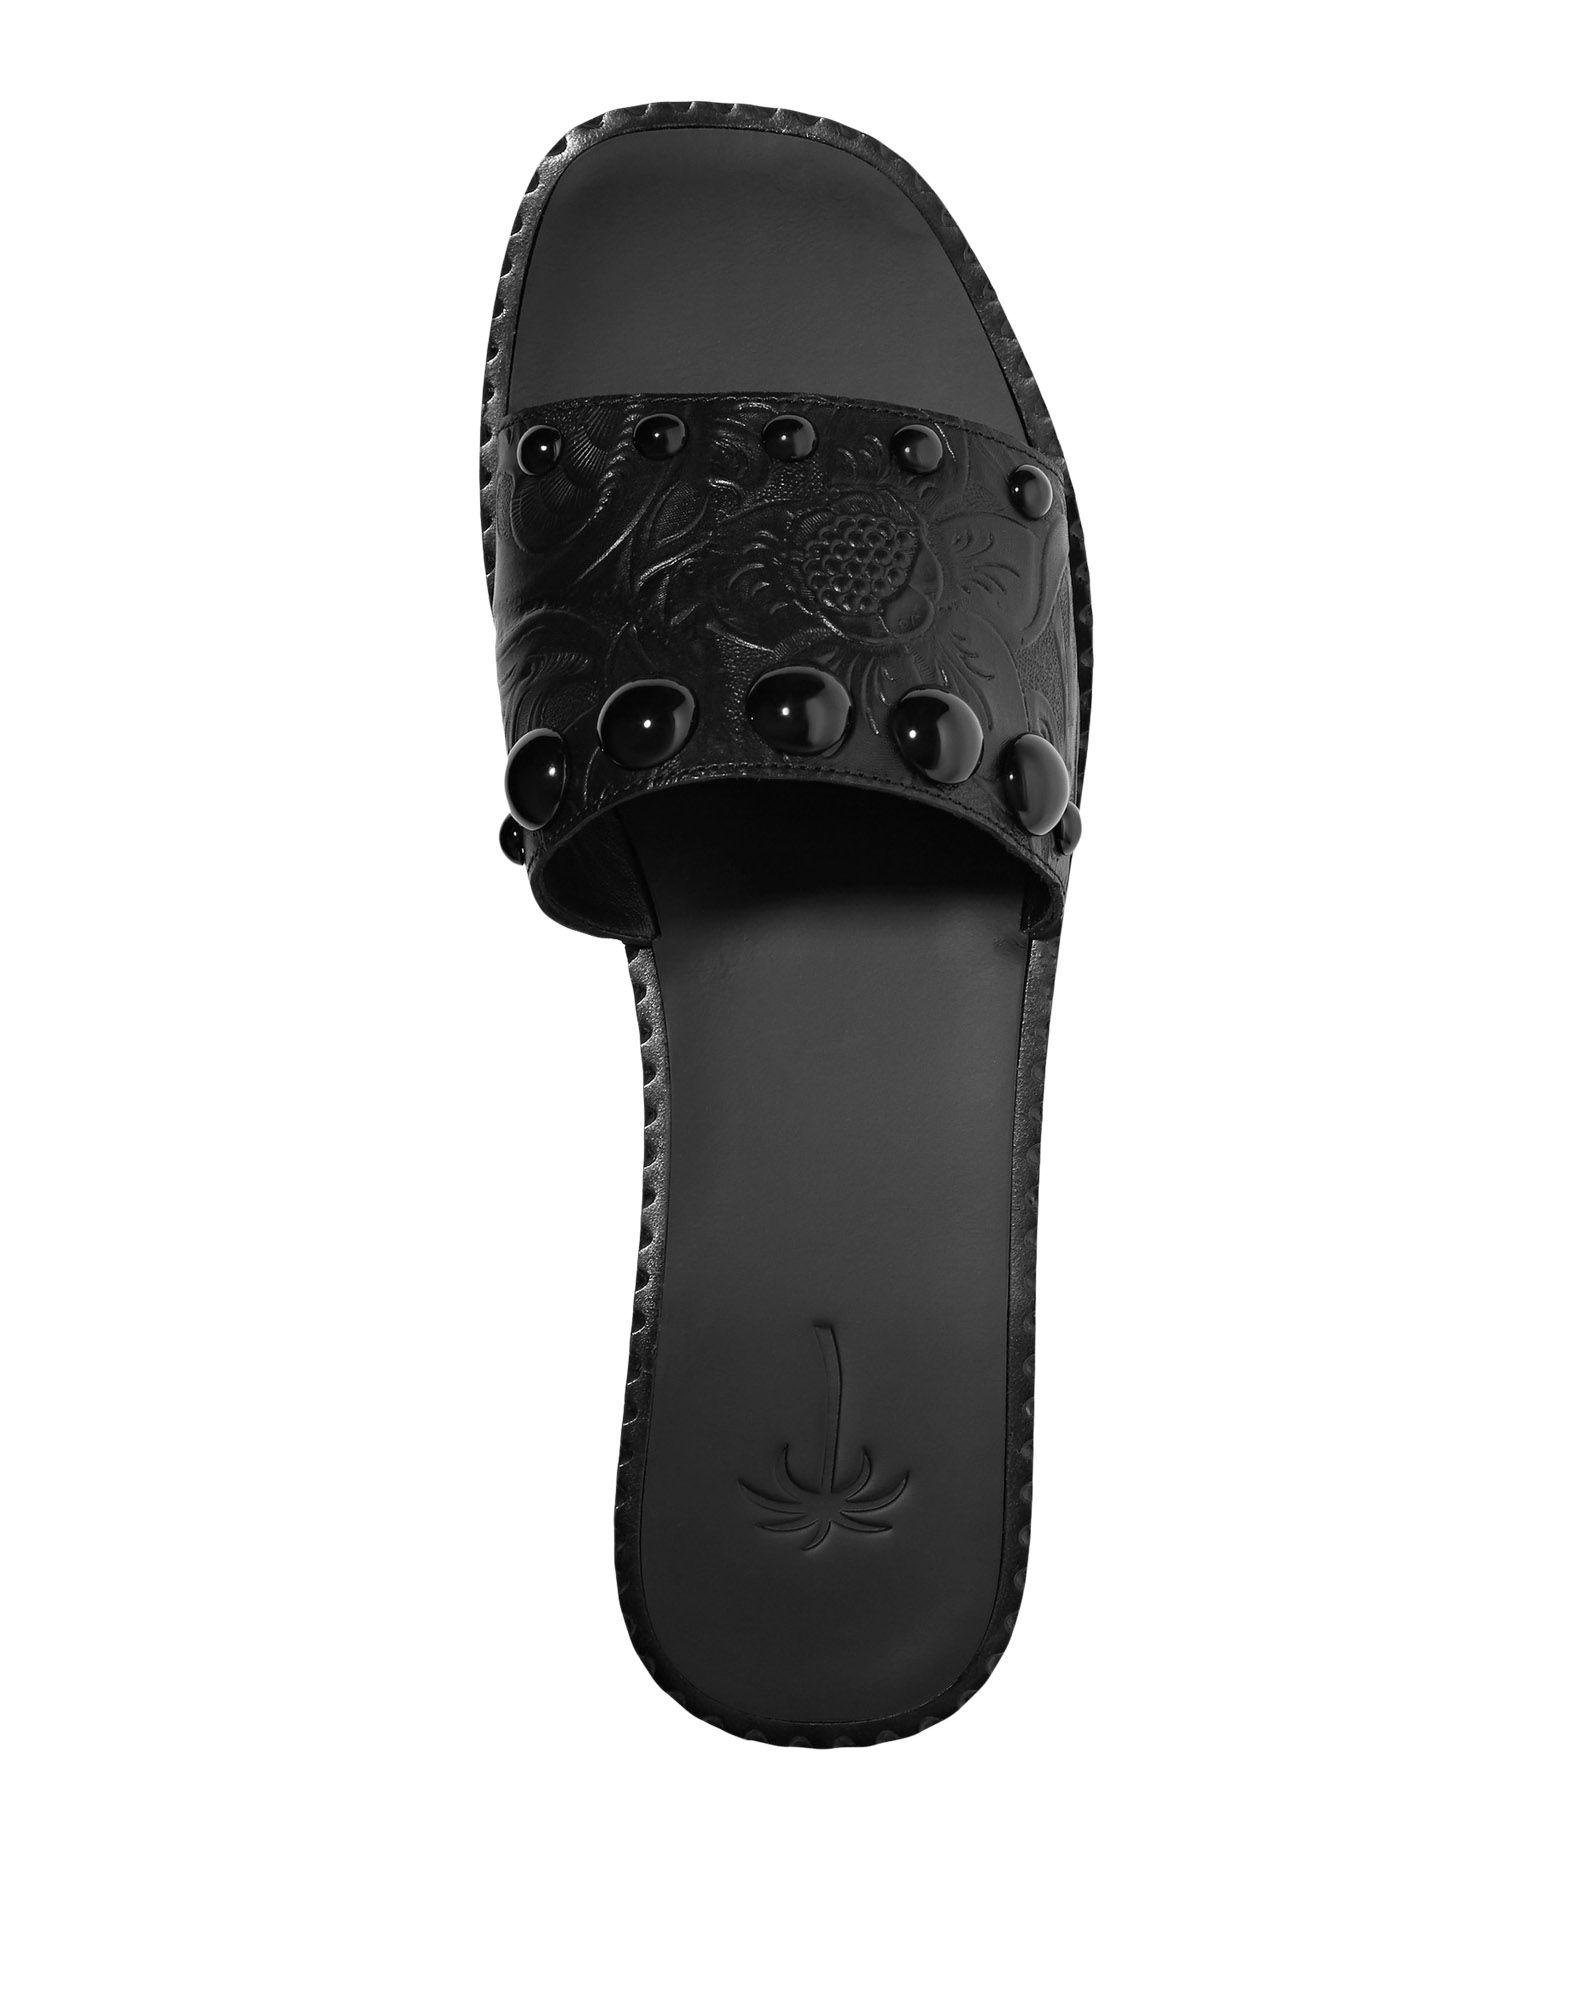 Stilvolle Sandalen billige Schuhe Tomas Maier Sandalen Stilvolle Damen  11524247PL cbfd1a